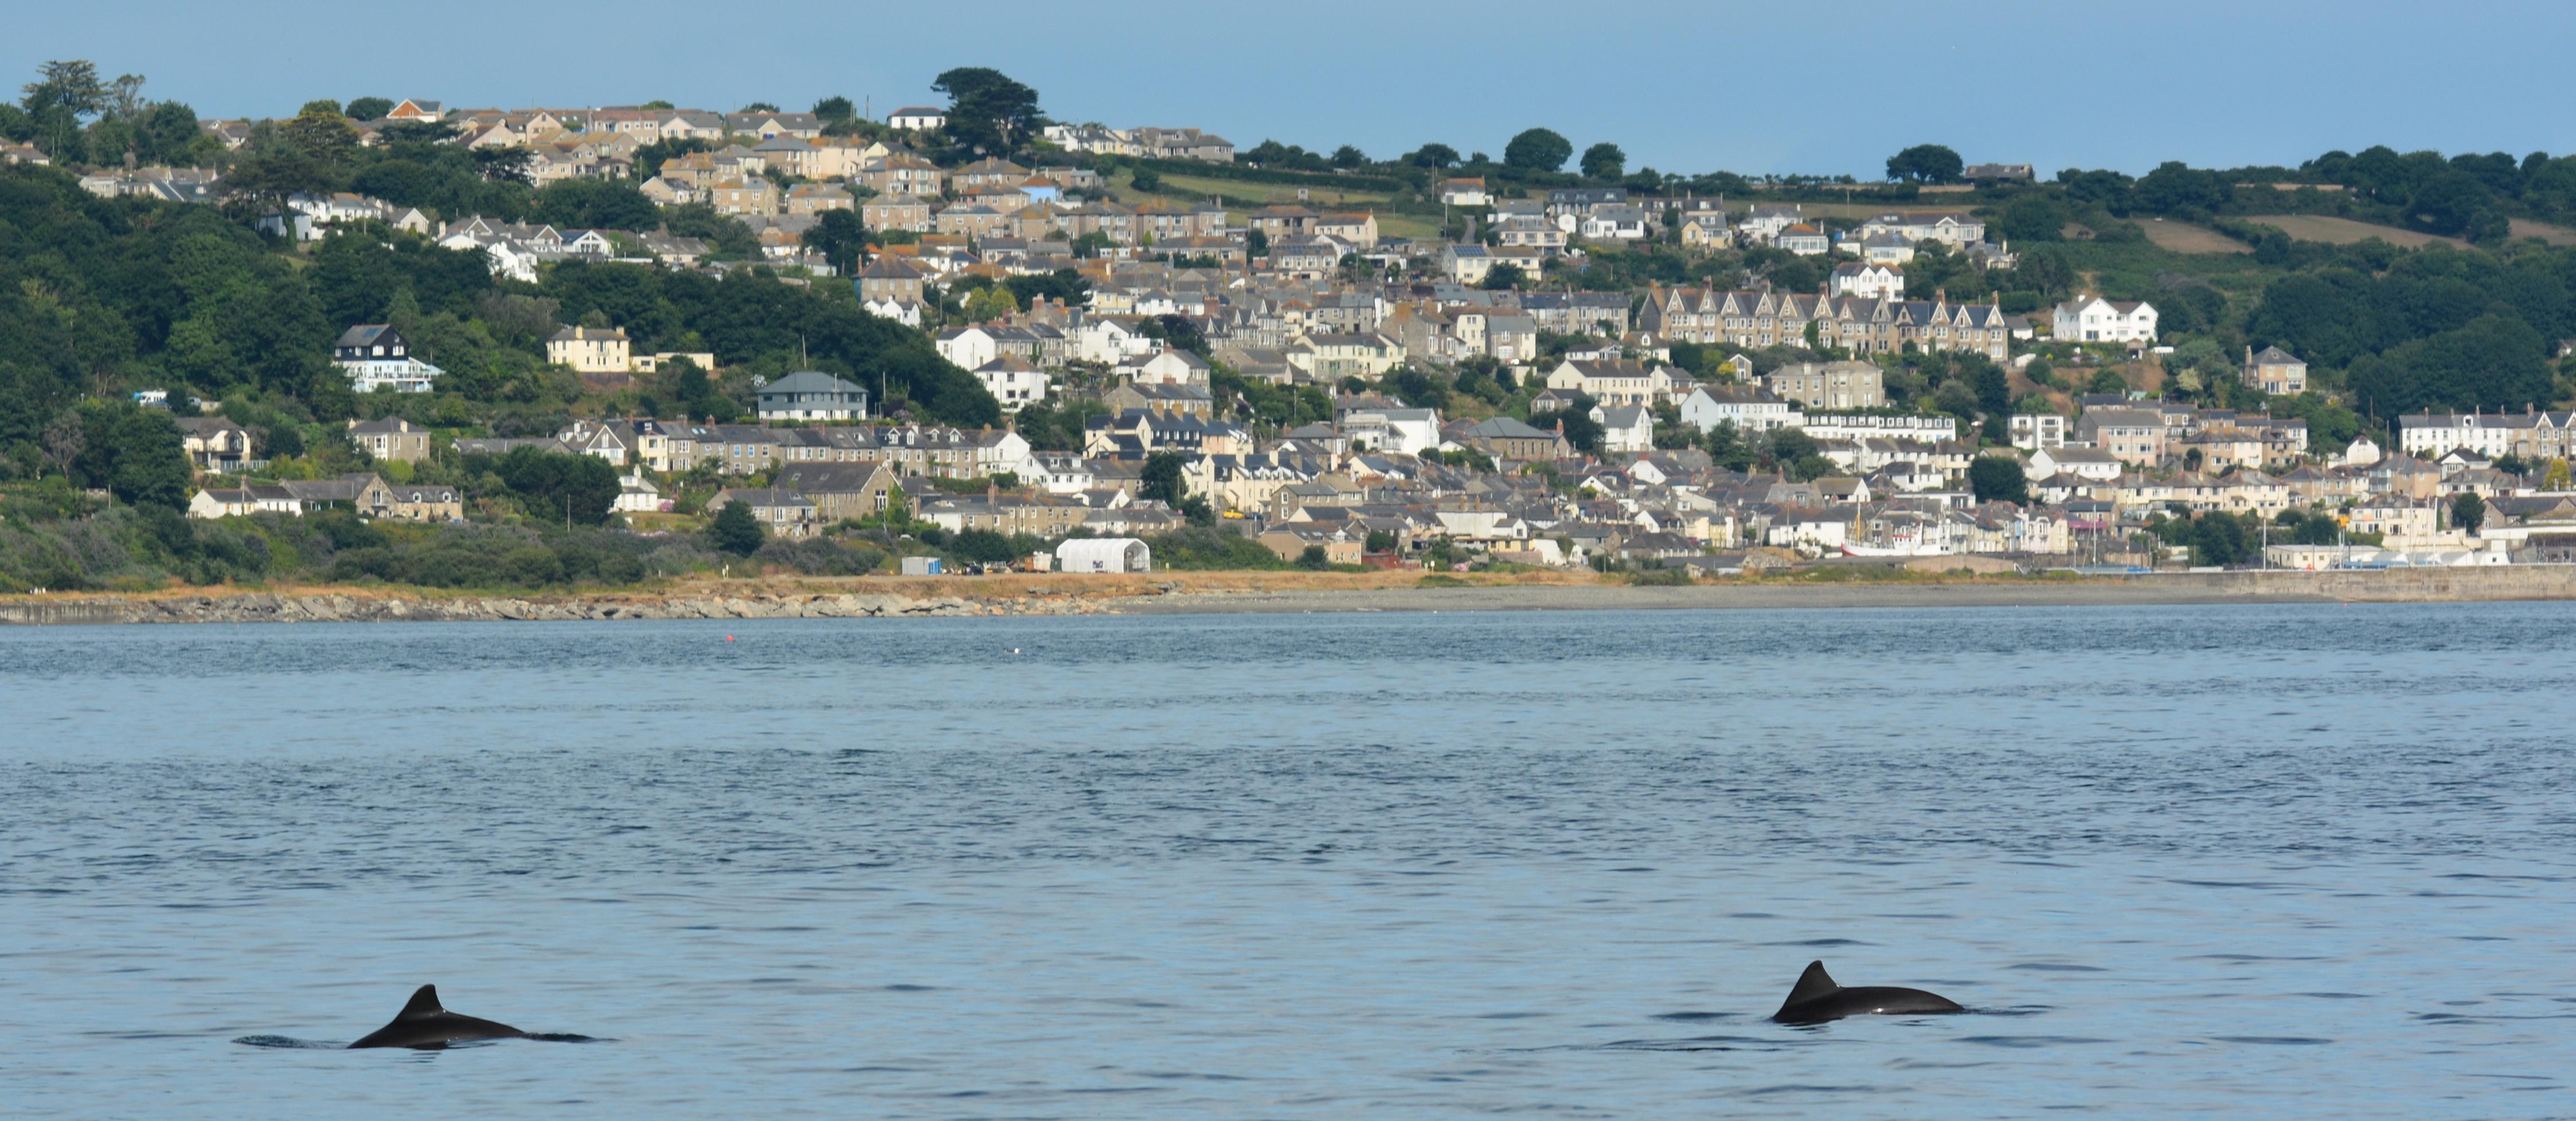 Harbour porpoises